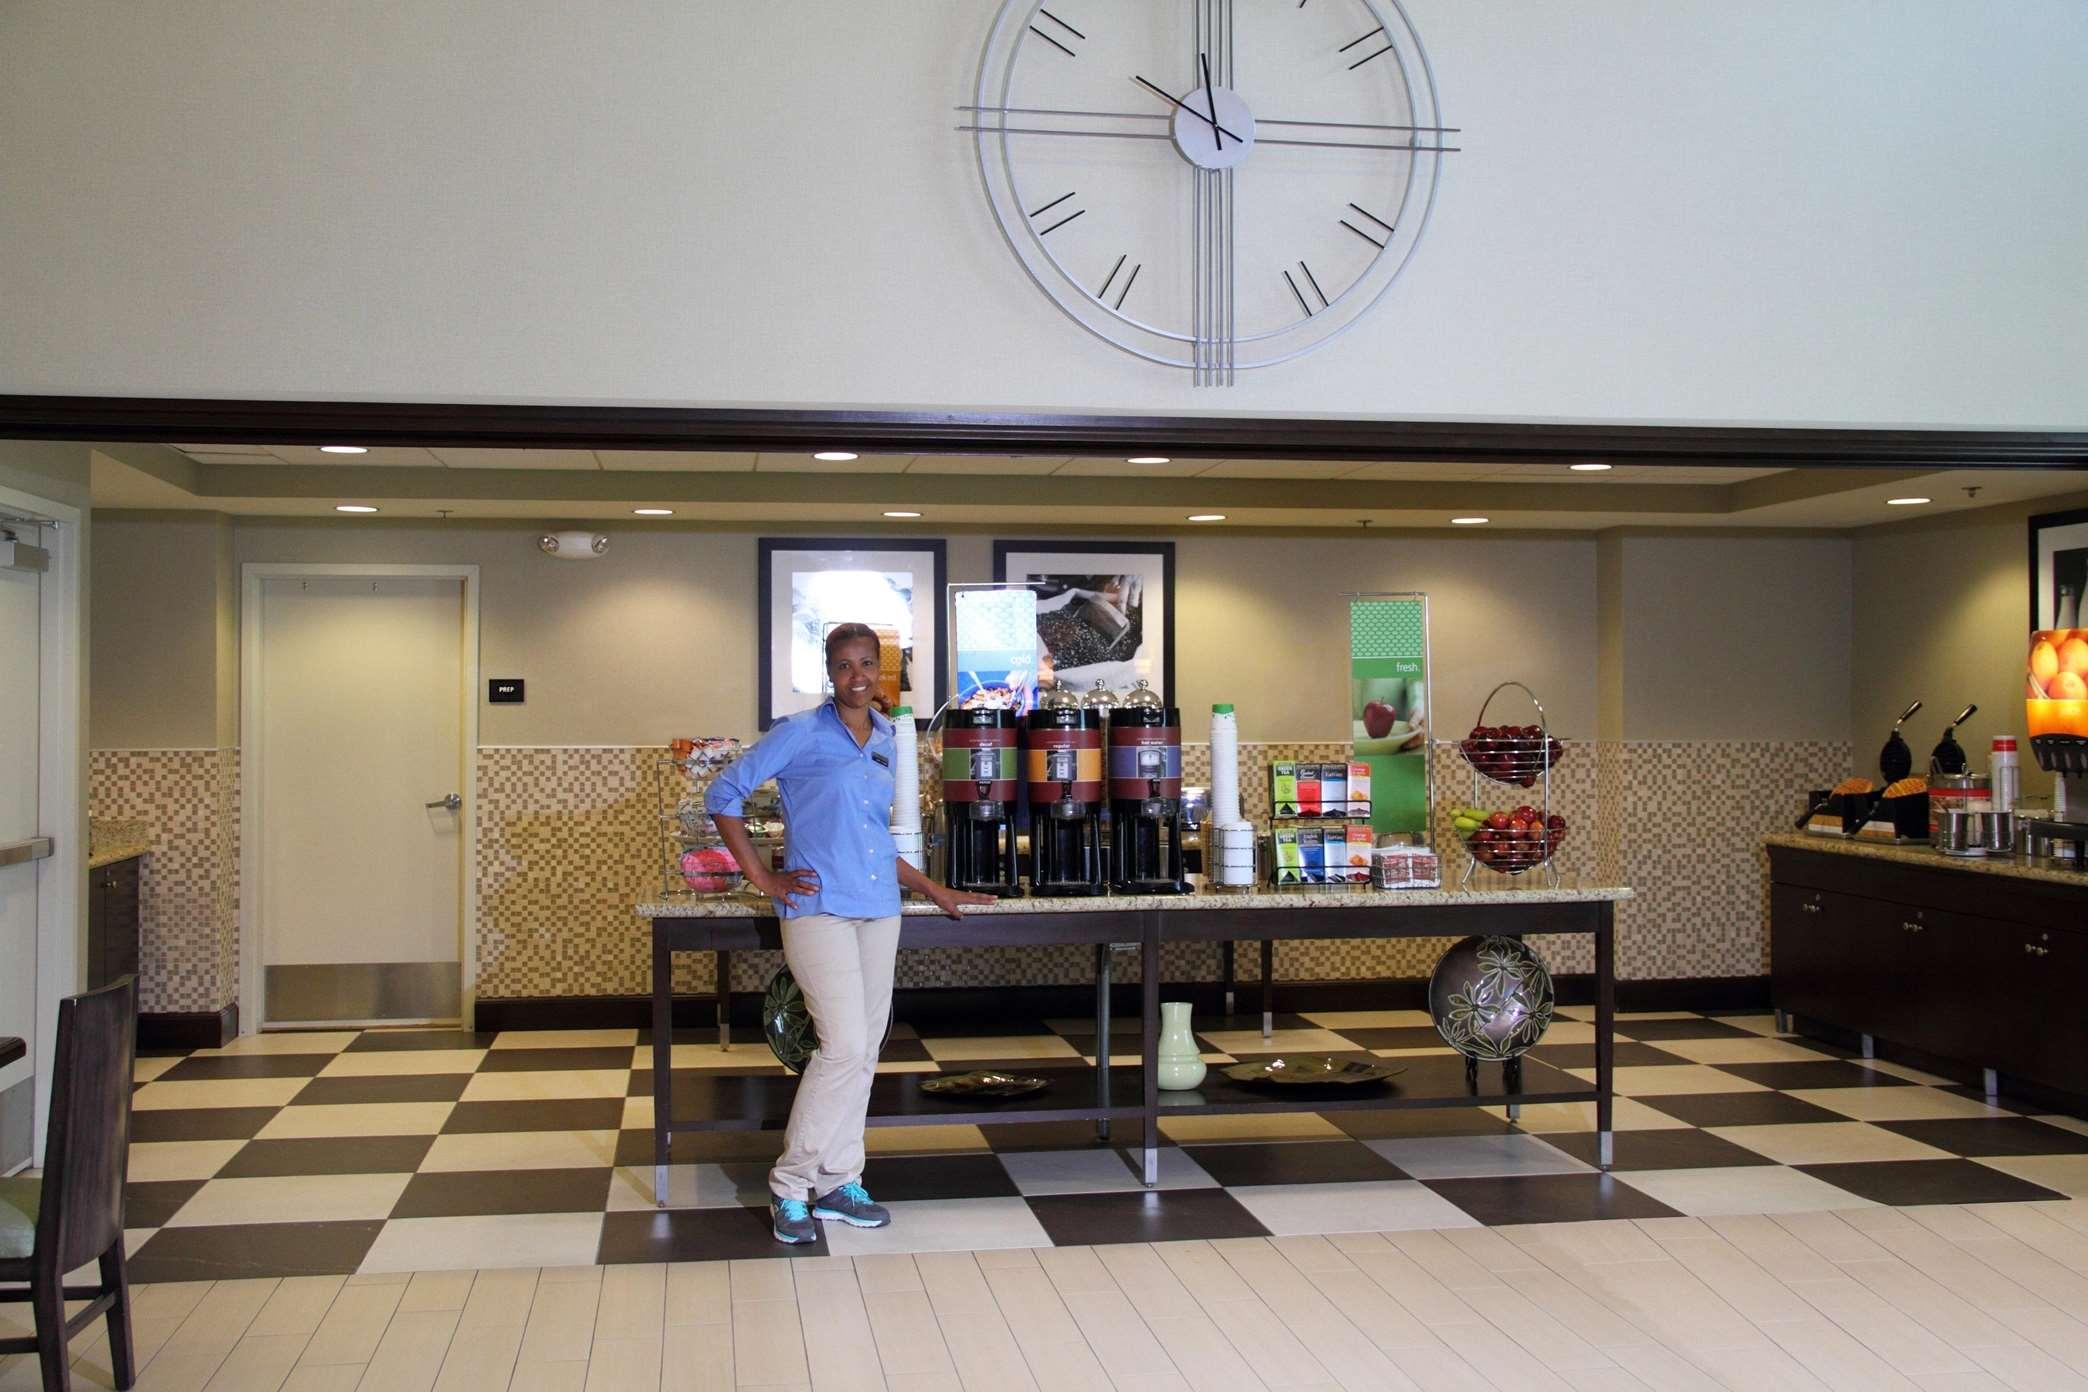 Hampton Inn & Suites Manteca image 34